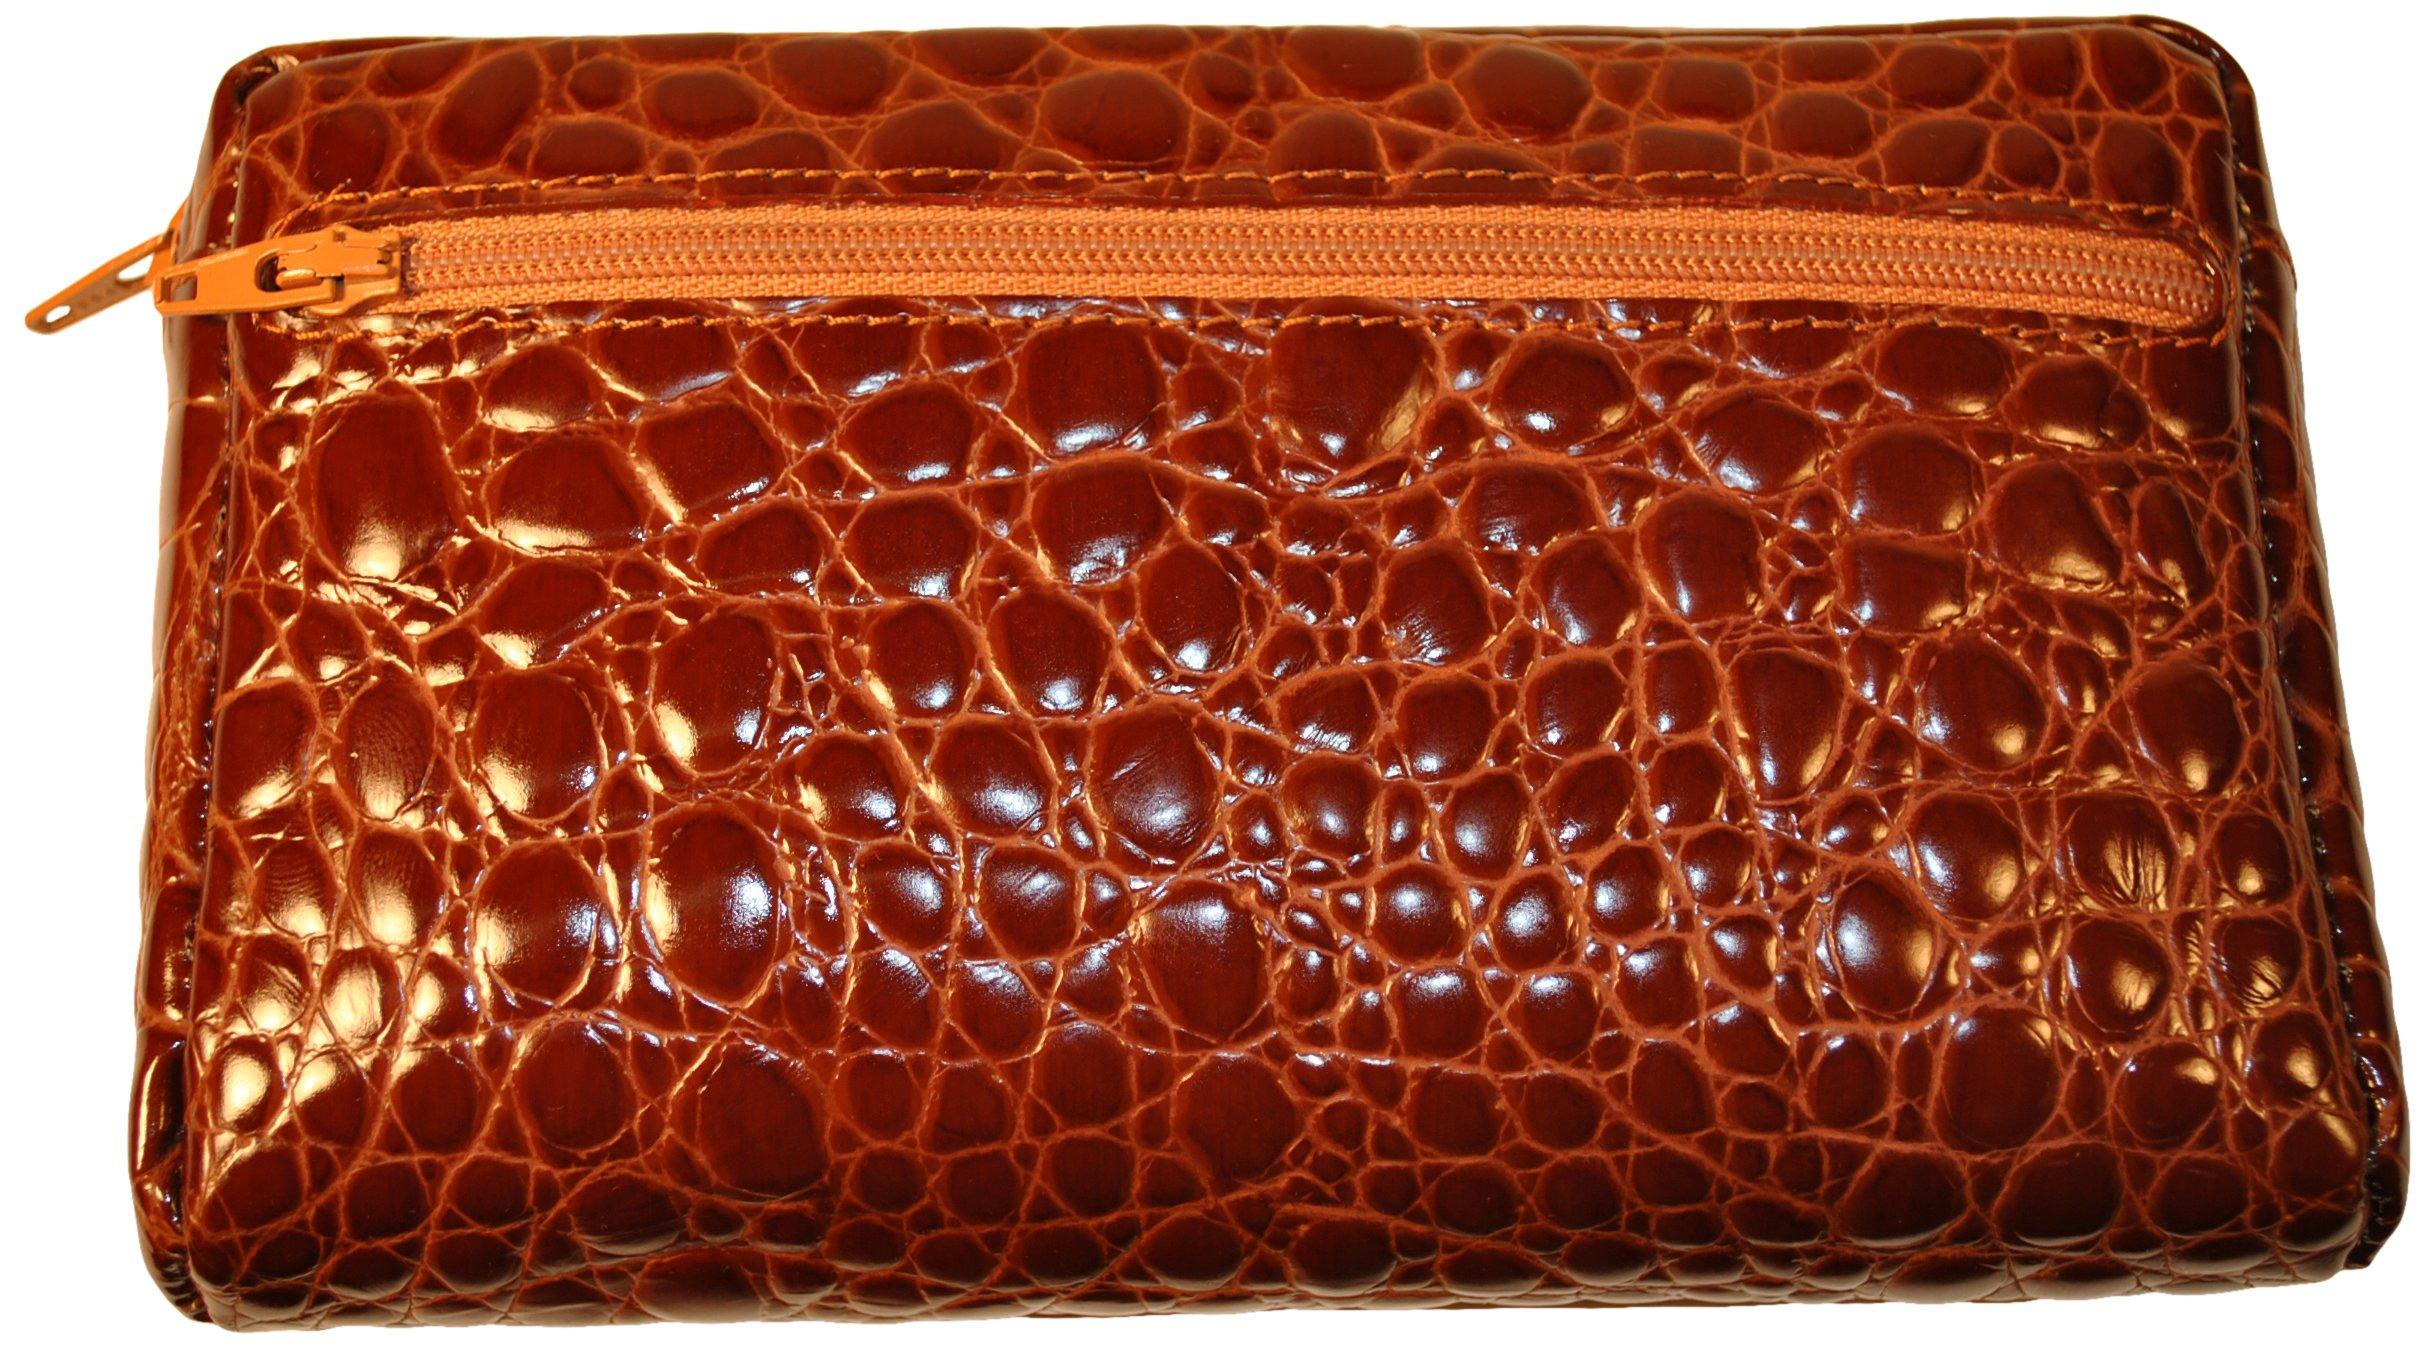 Budd Leather Croco Bidente Cosmetic Case, Cognac by Budd Leather